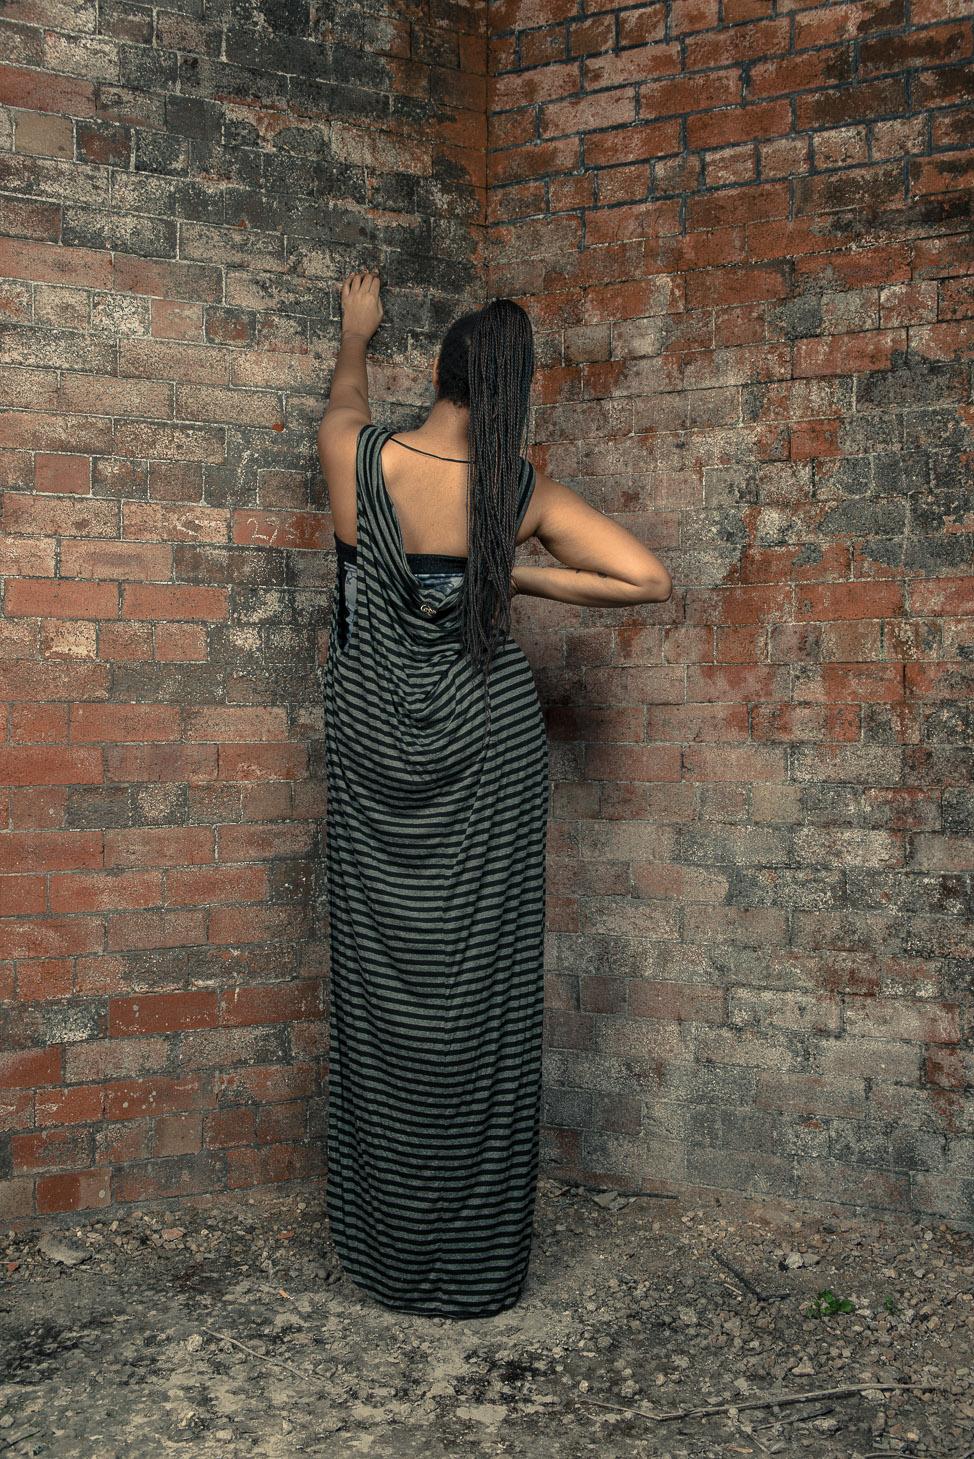 zaramia-ava-zaramiaava-leeds-fashion-designer-ethical-sustainable-tailored-minimalist-stripe-bodysuit-versatile-drape-dress-top-black-grey-print-belt-wrap-cowl-styling-bodysuit-womenswear-models-14